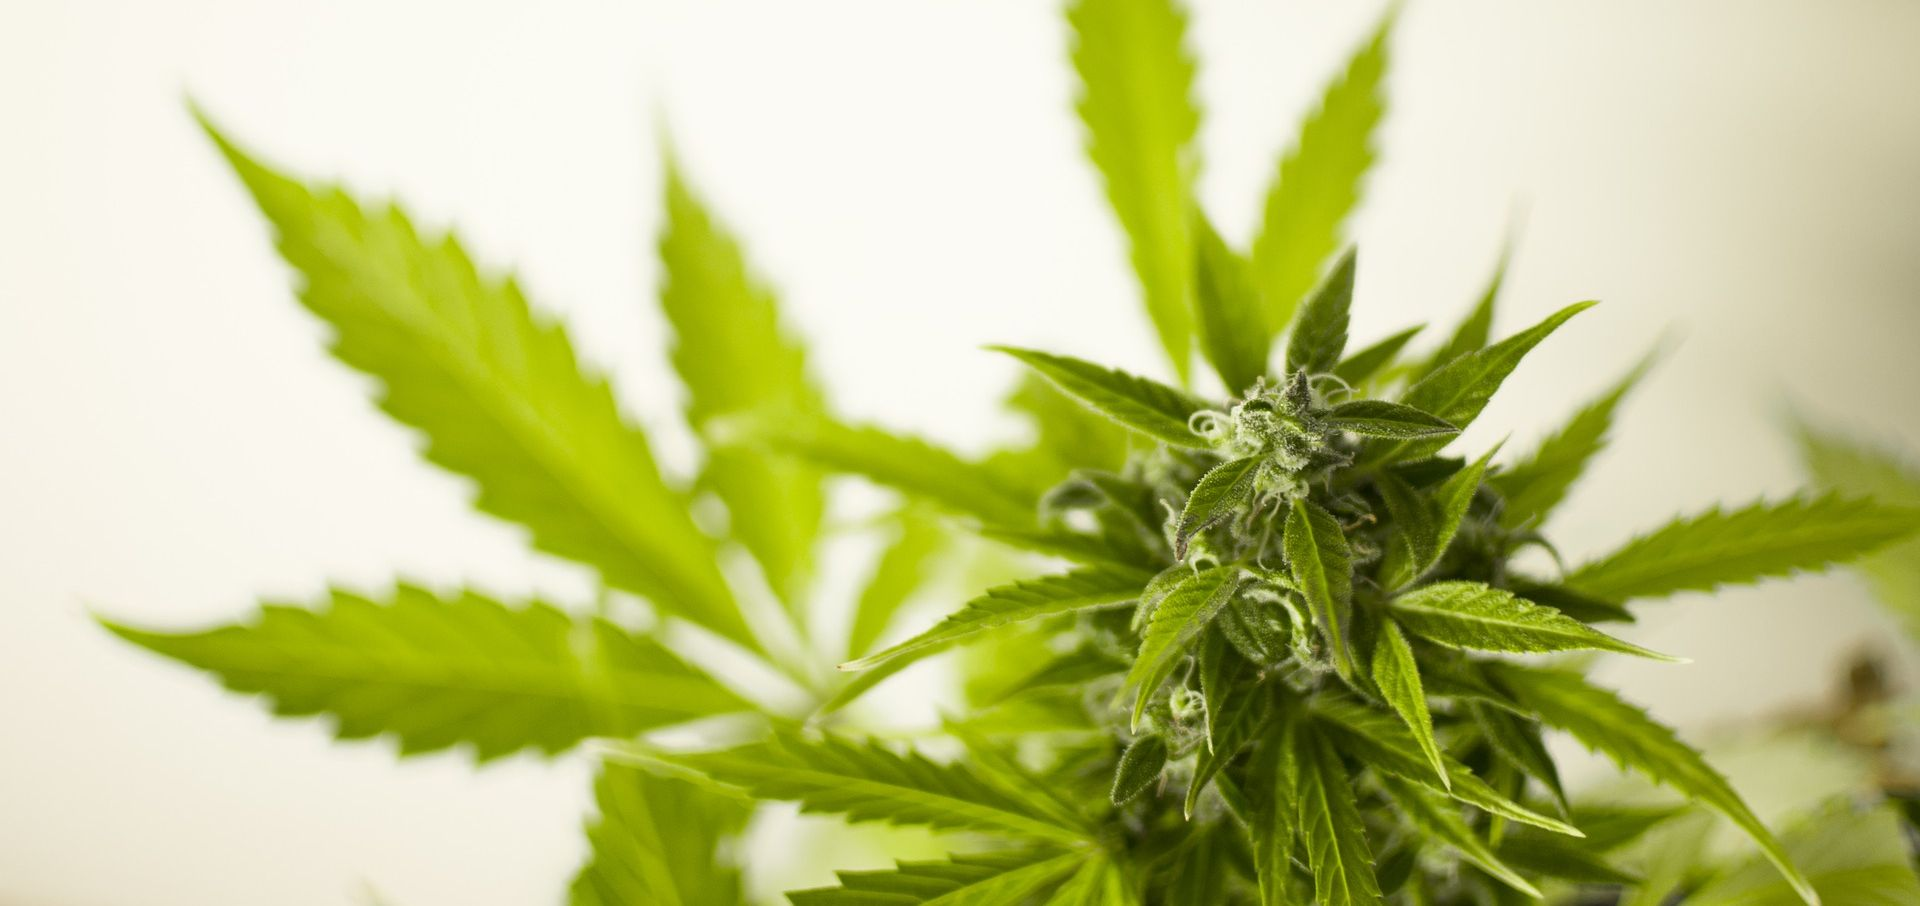 Trogir: Uhićen diler sa 17 kilograma marihuane